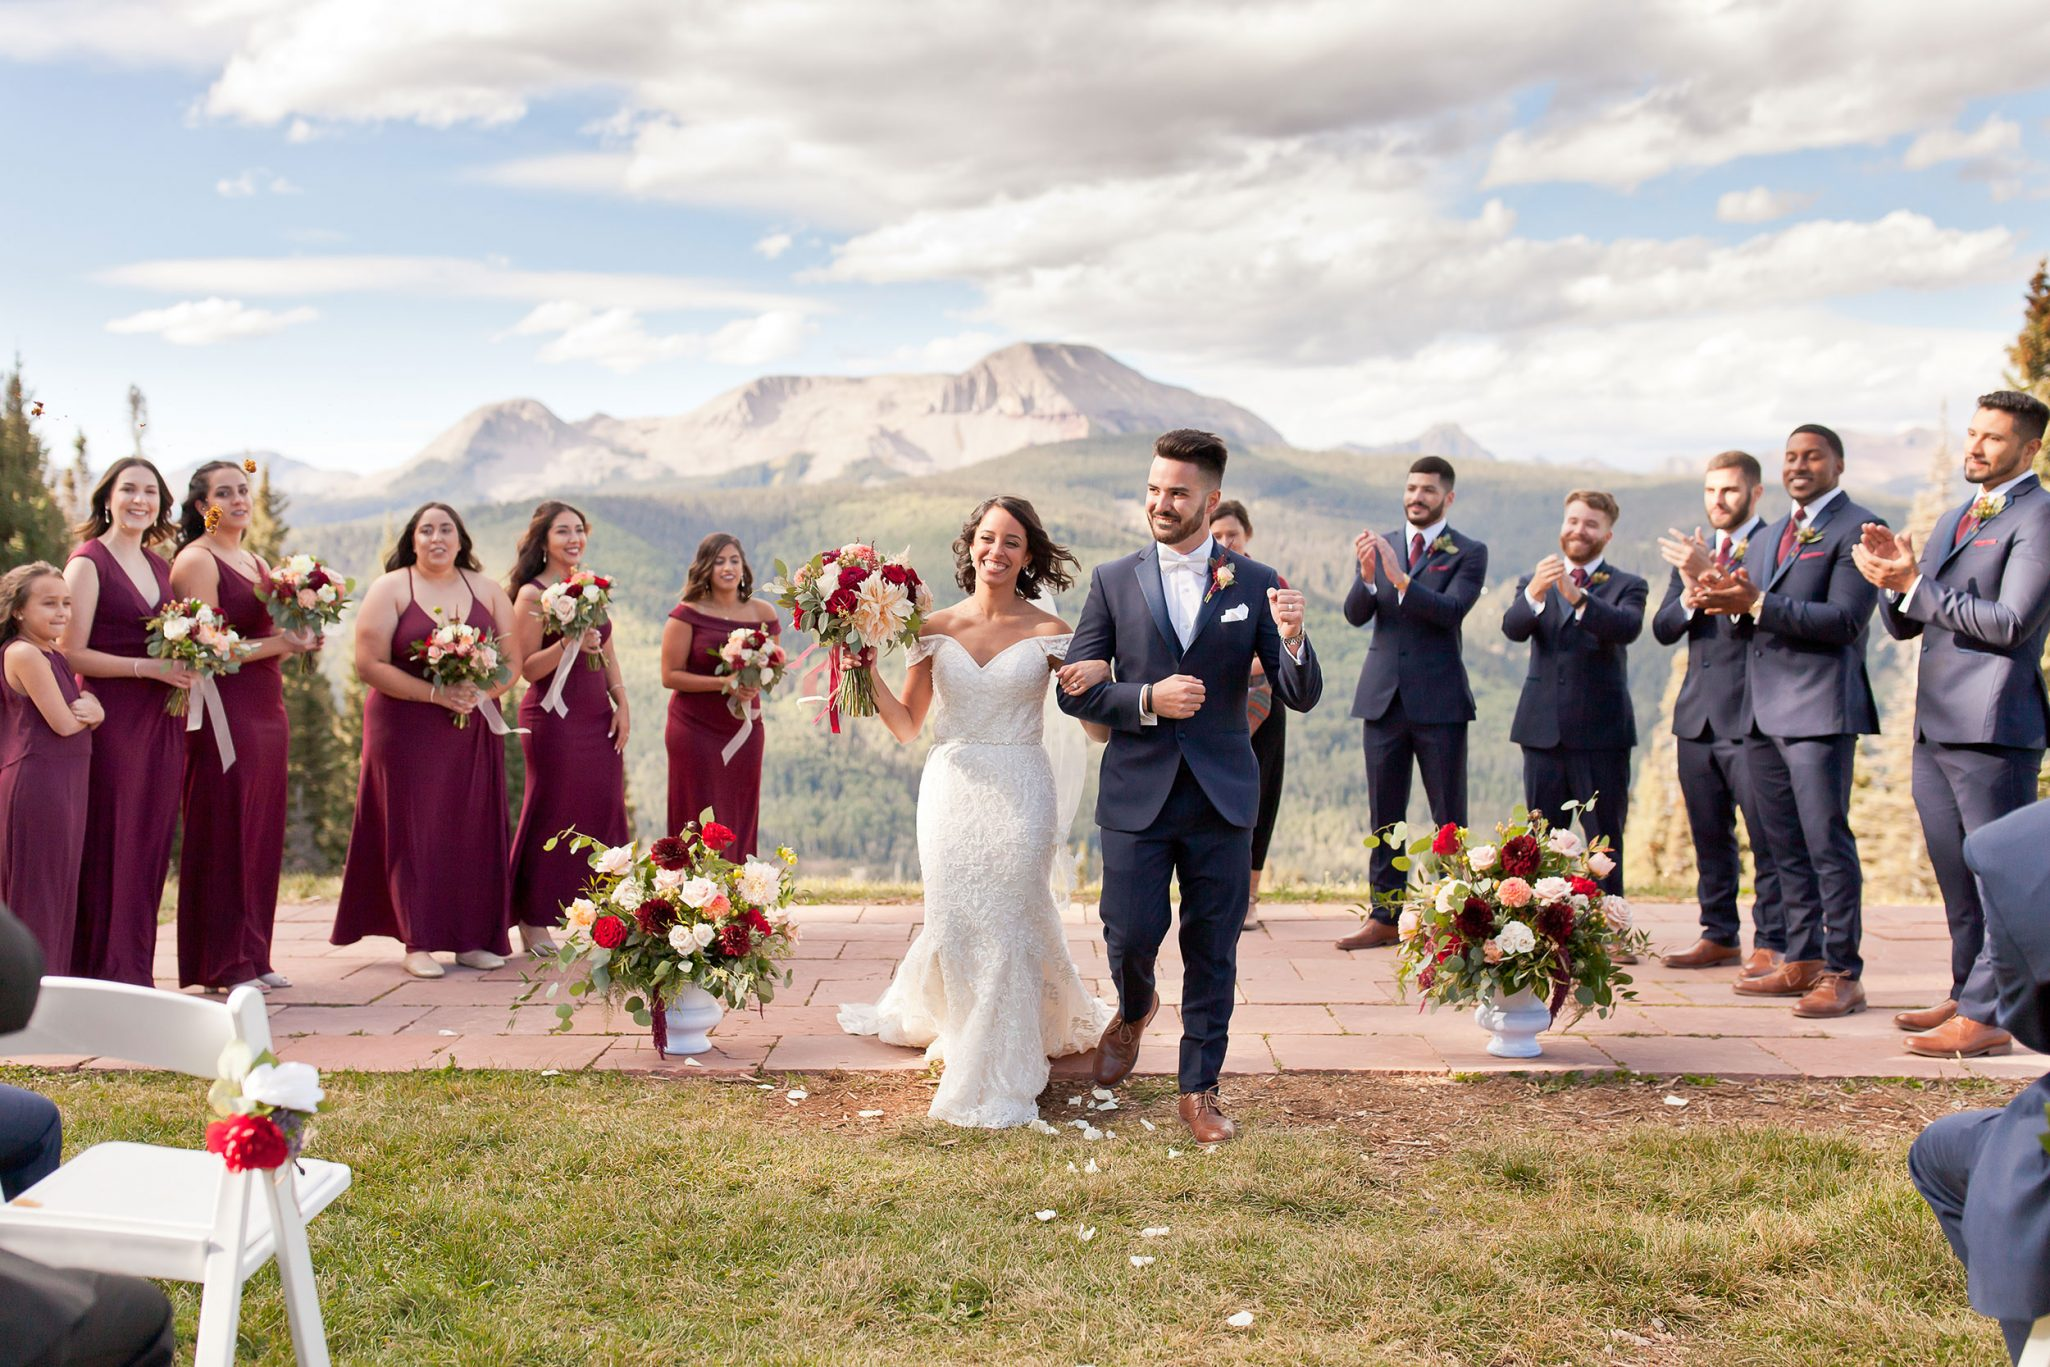 Bride & Groom just married at Purgatory Resort, Durango Colorado